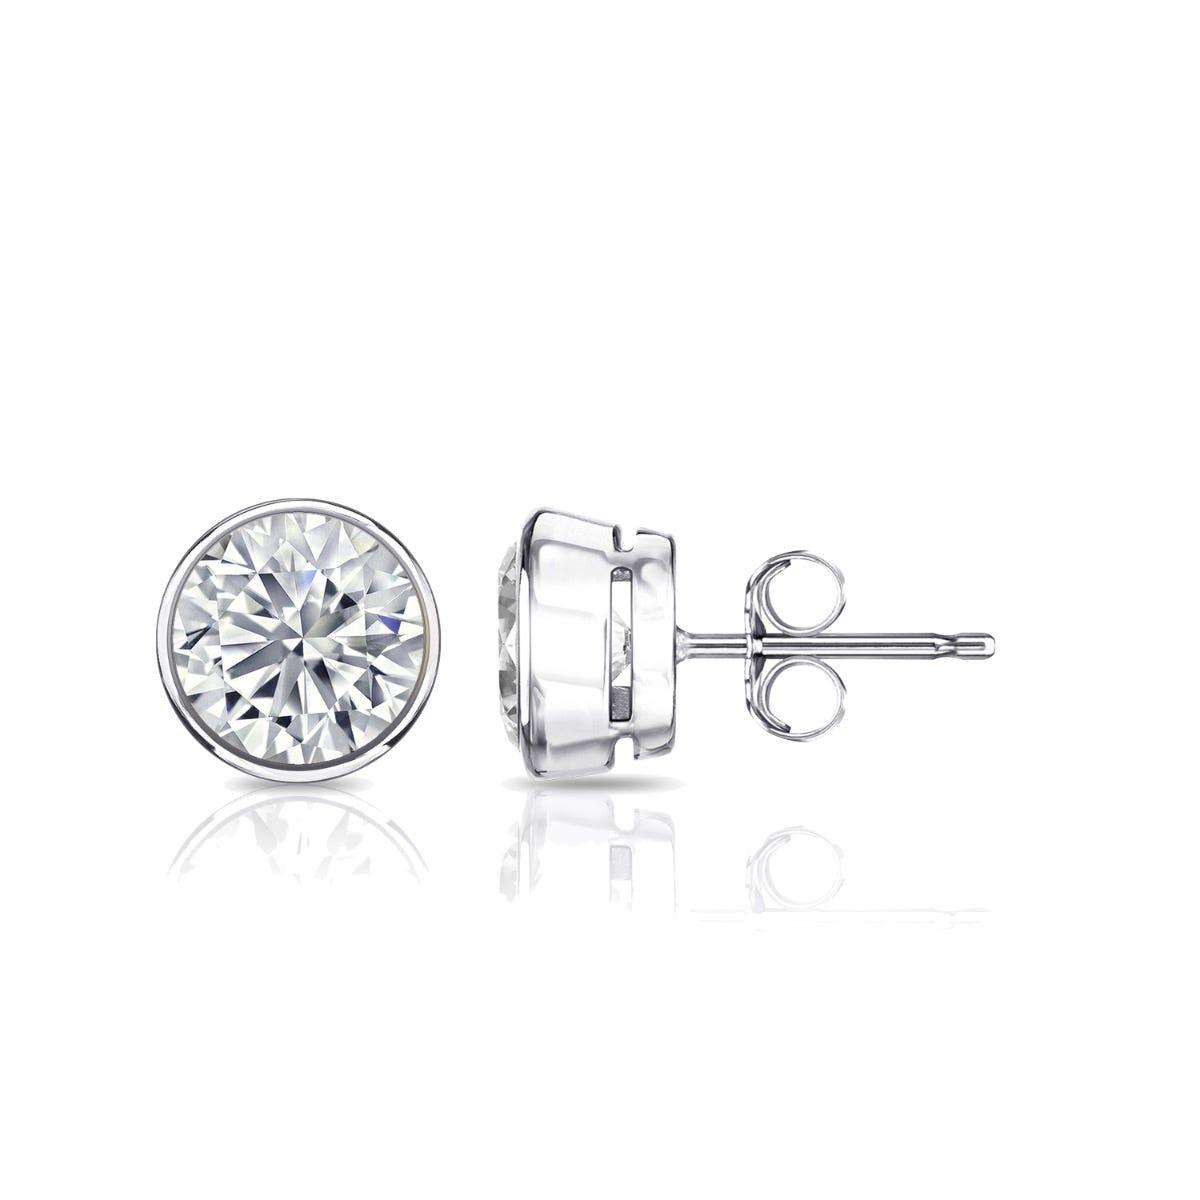 Diamond Round Bezel-Set 1ctw. Solitaire Stud (IJ-SI2) Earrings in 18K White Gold